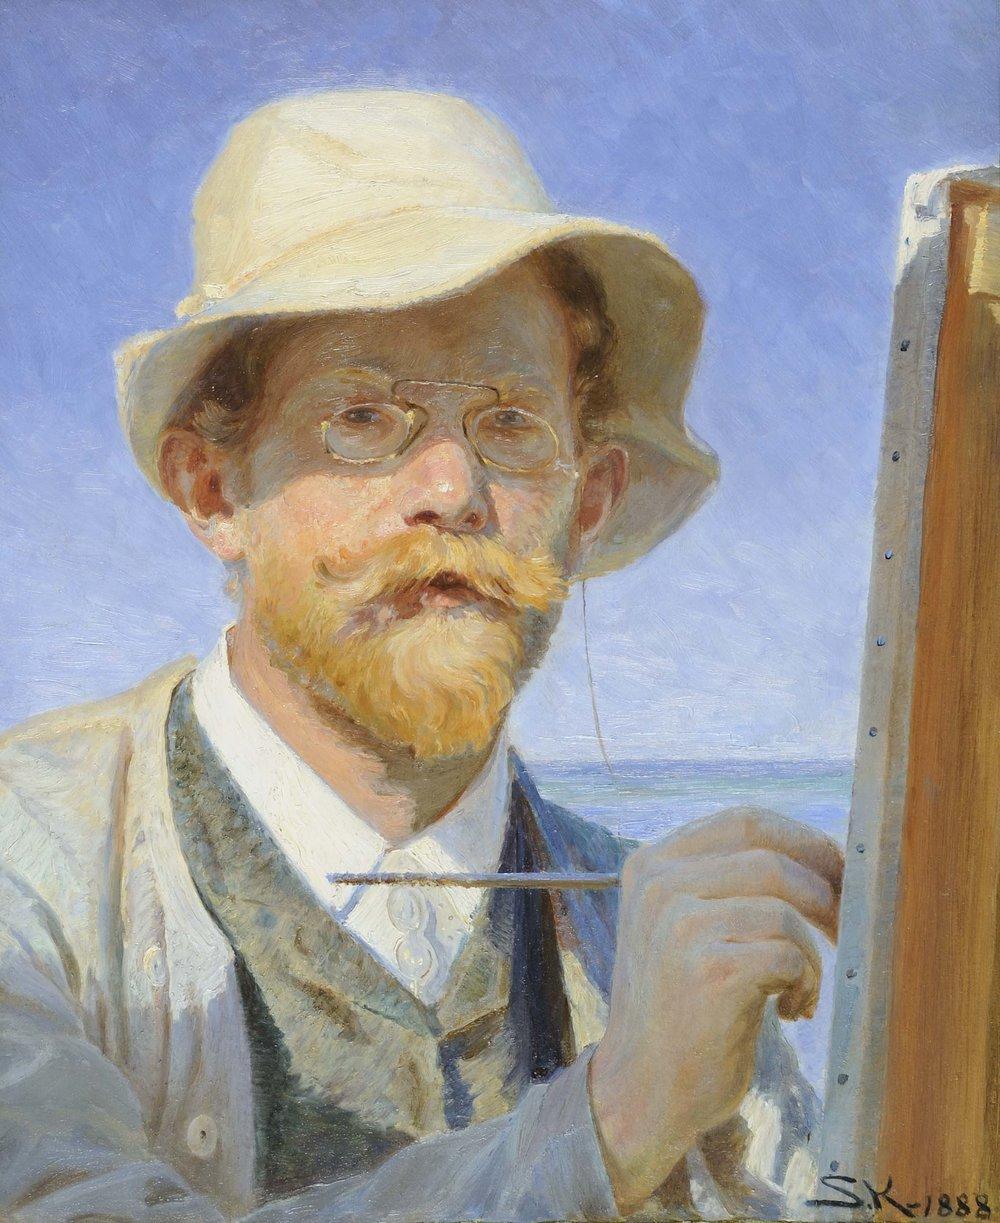 Peder Krøyer